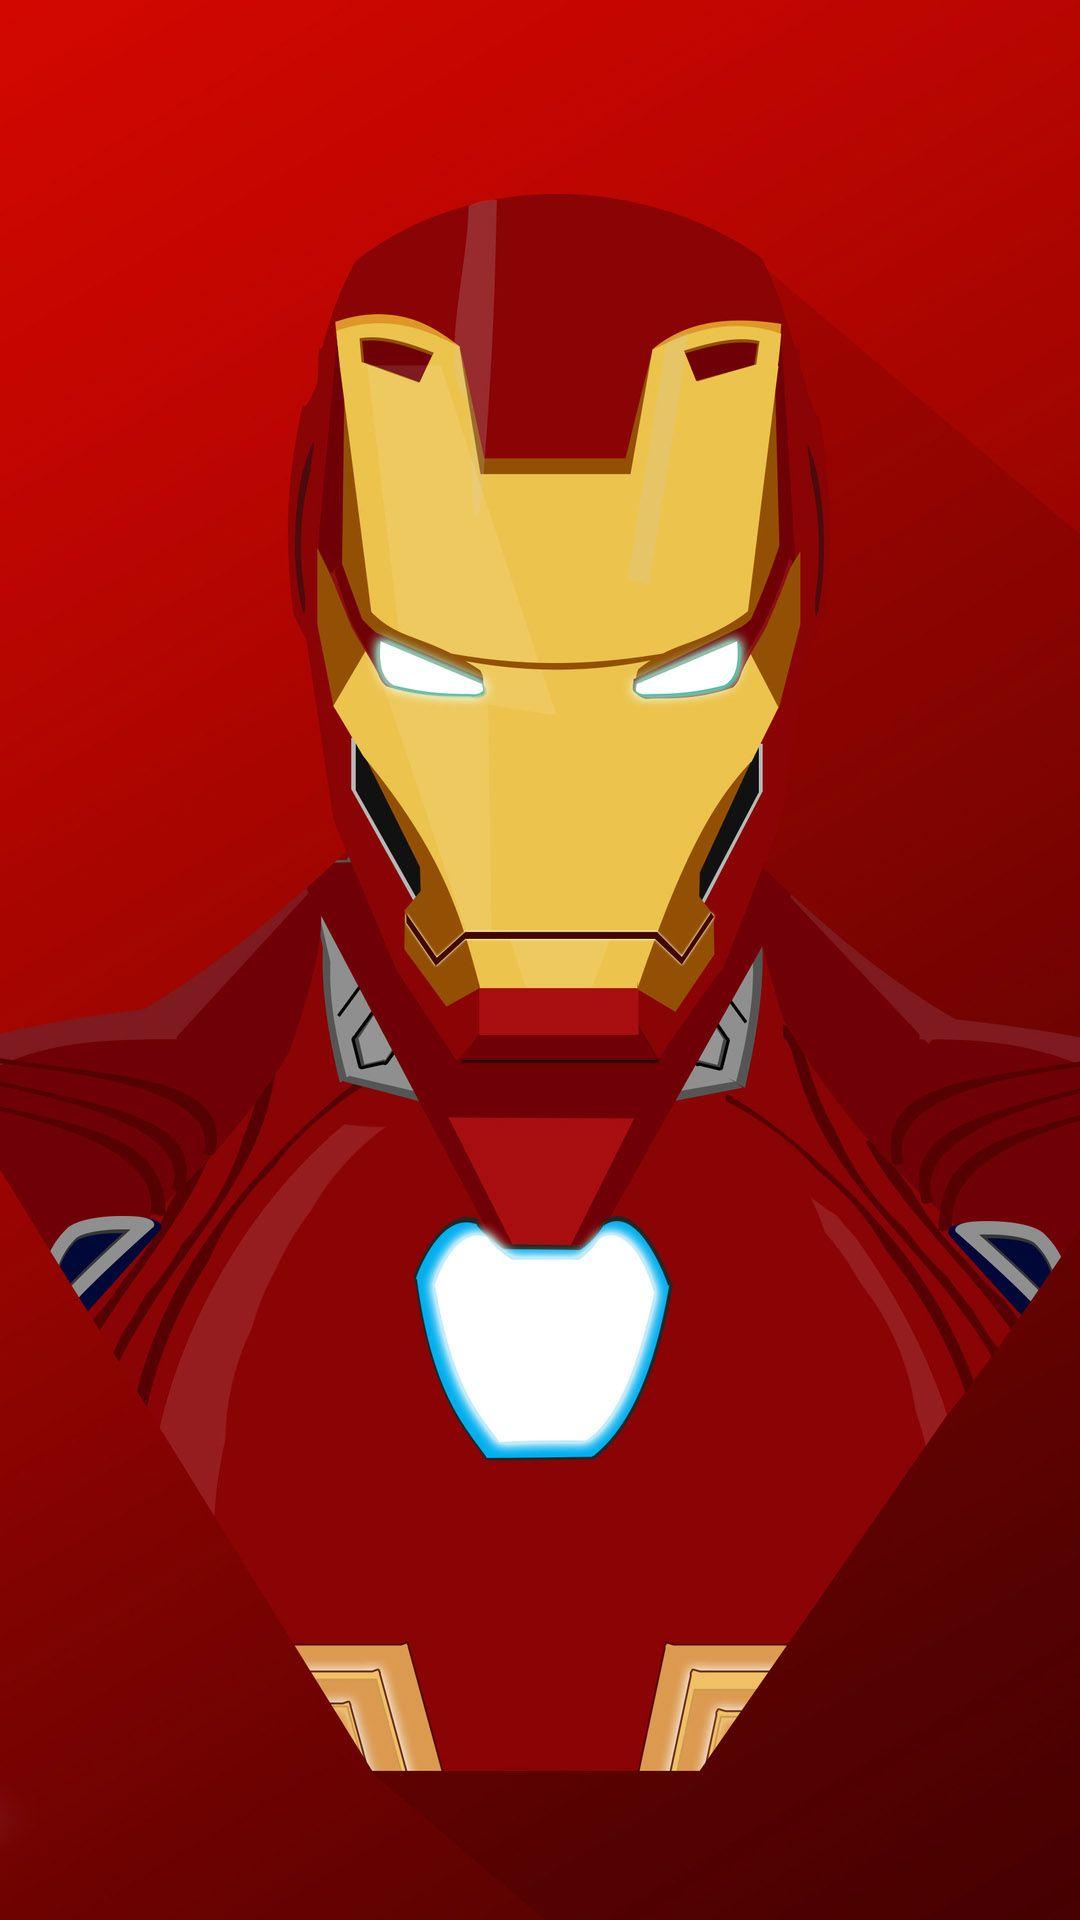 Iron Man Bleeding Edge Armor Iphone Wallpaper Iron Man Wallpaper Iron Man Iron Man Drawing